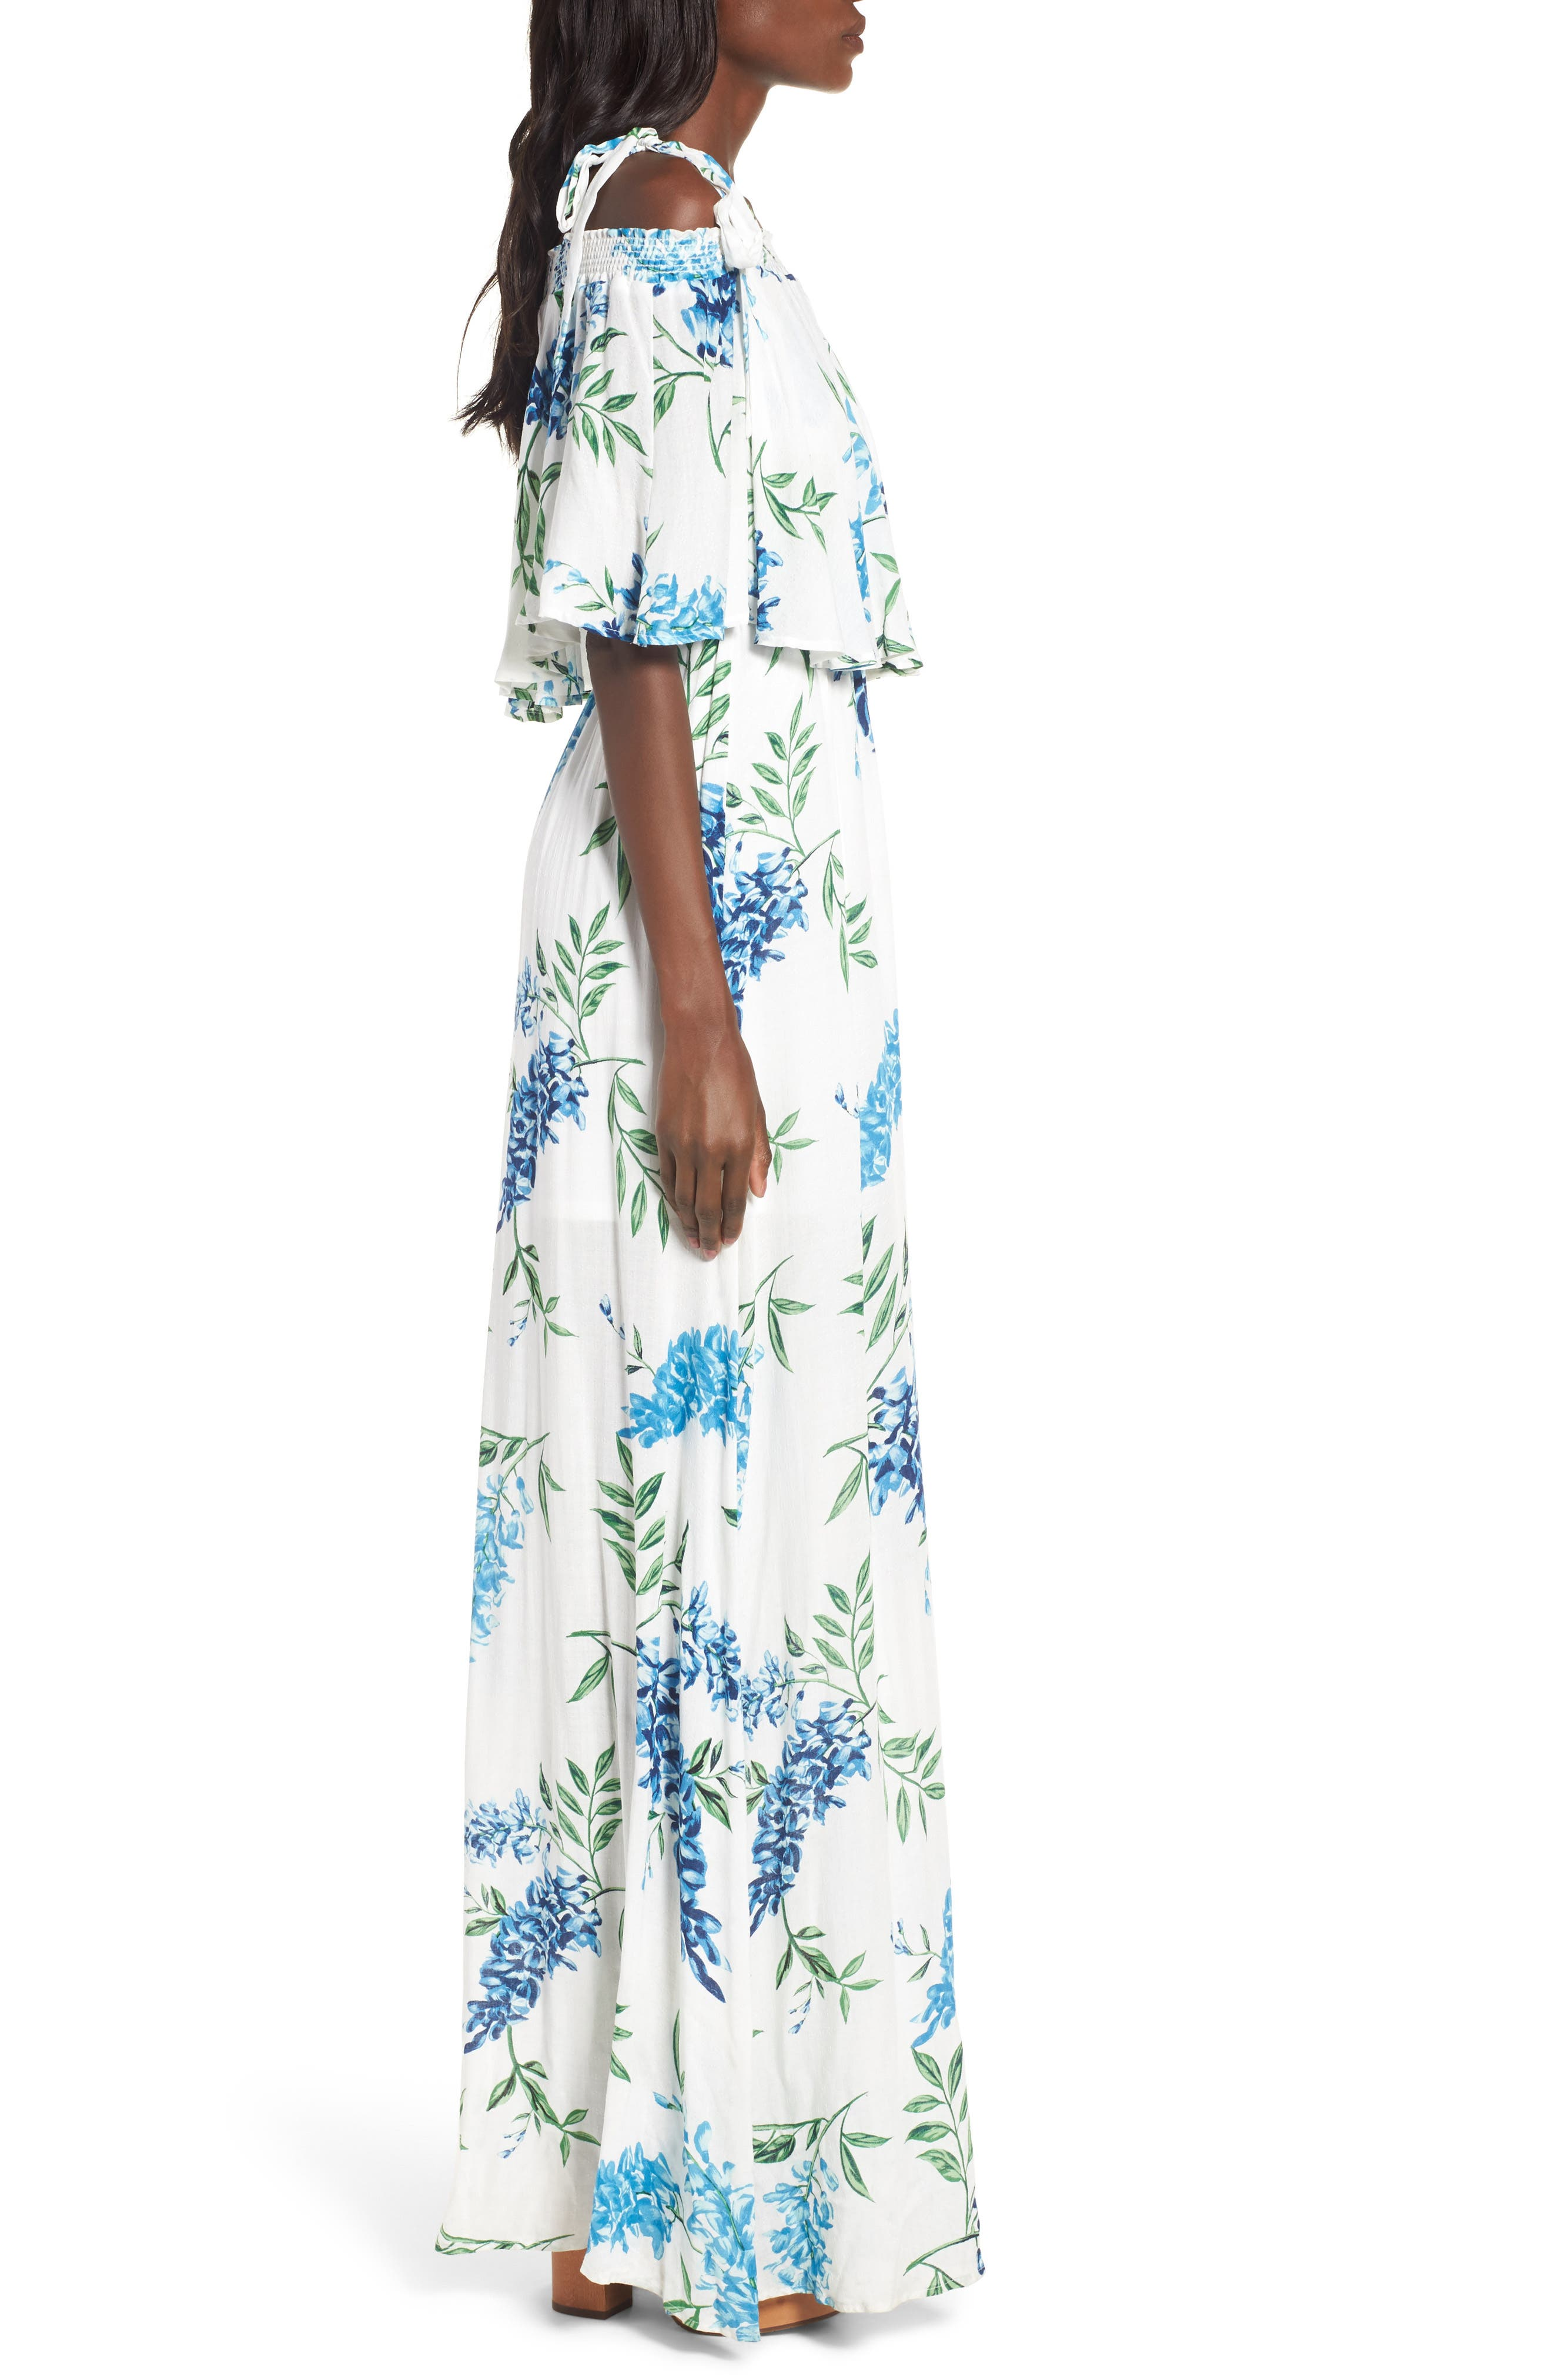 Nicola Ruffle Maxi Dress,                             Alternate thumbnail 3, color,                             Wisteria Wonder Challis